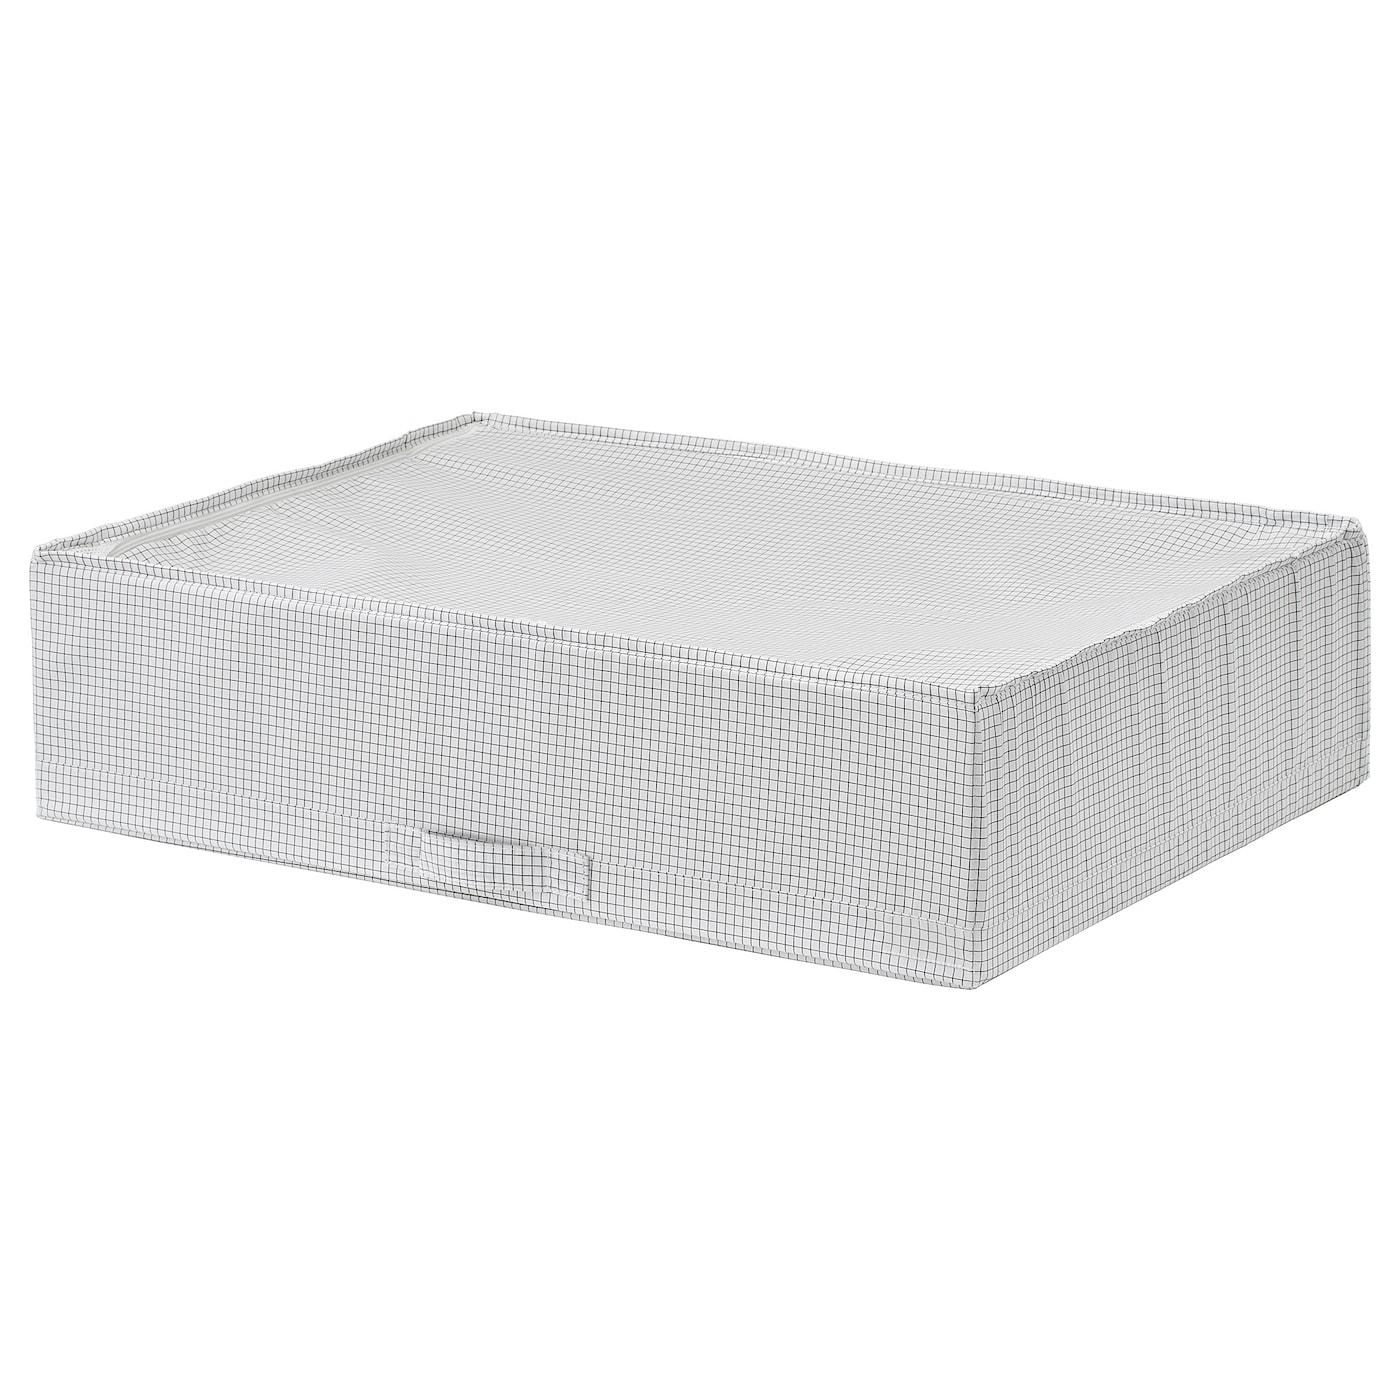 IKEA STUK Tasche - 71 x 51 x 18 cm